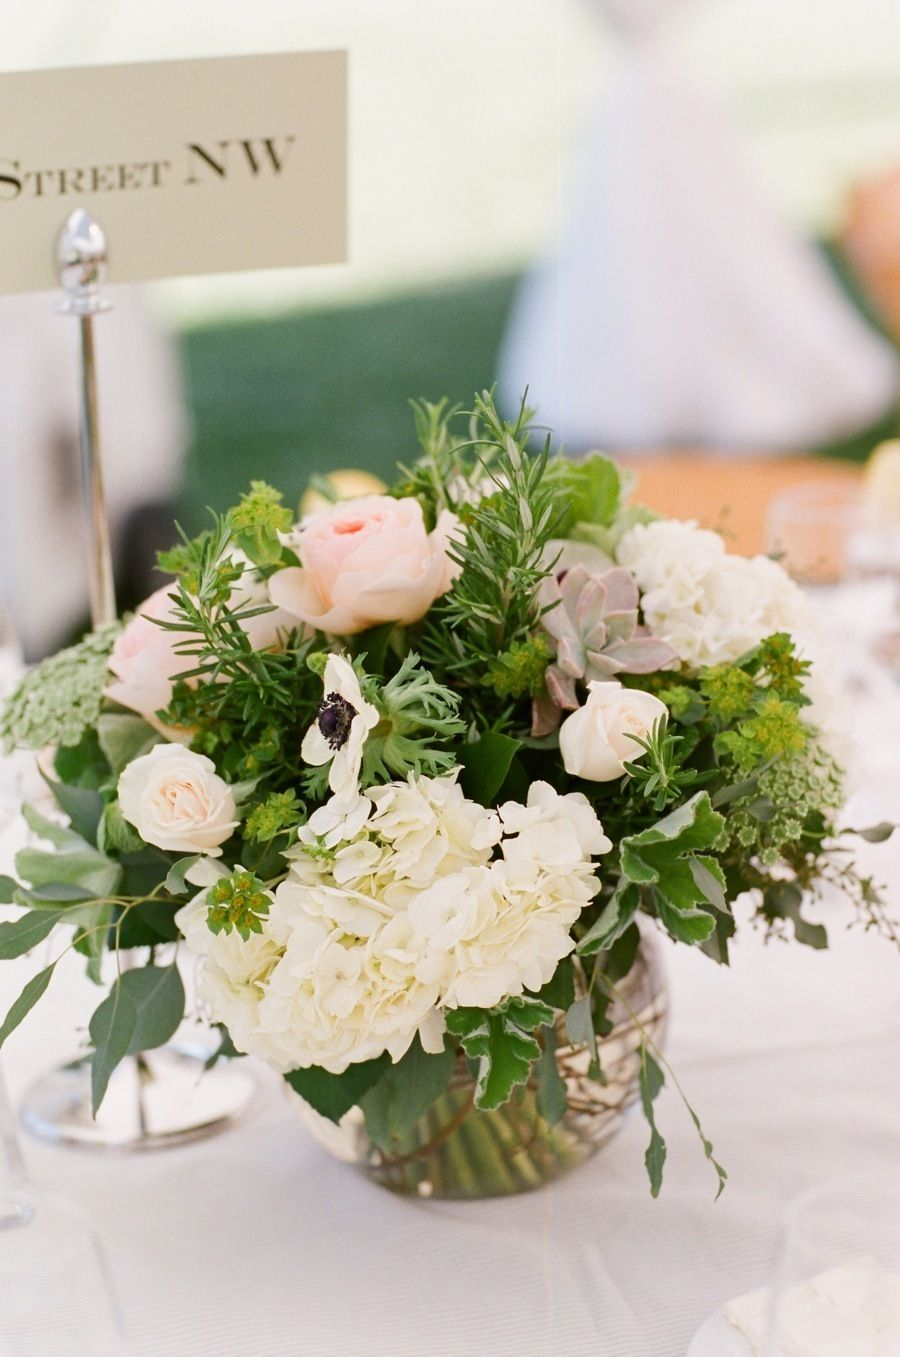 Ojai Wedding from Michael Anna Costa